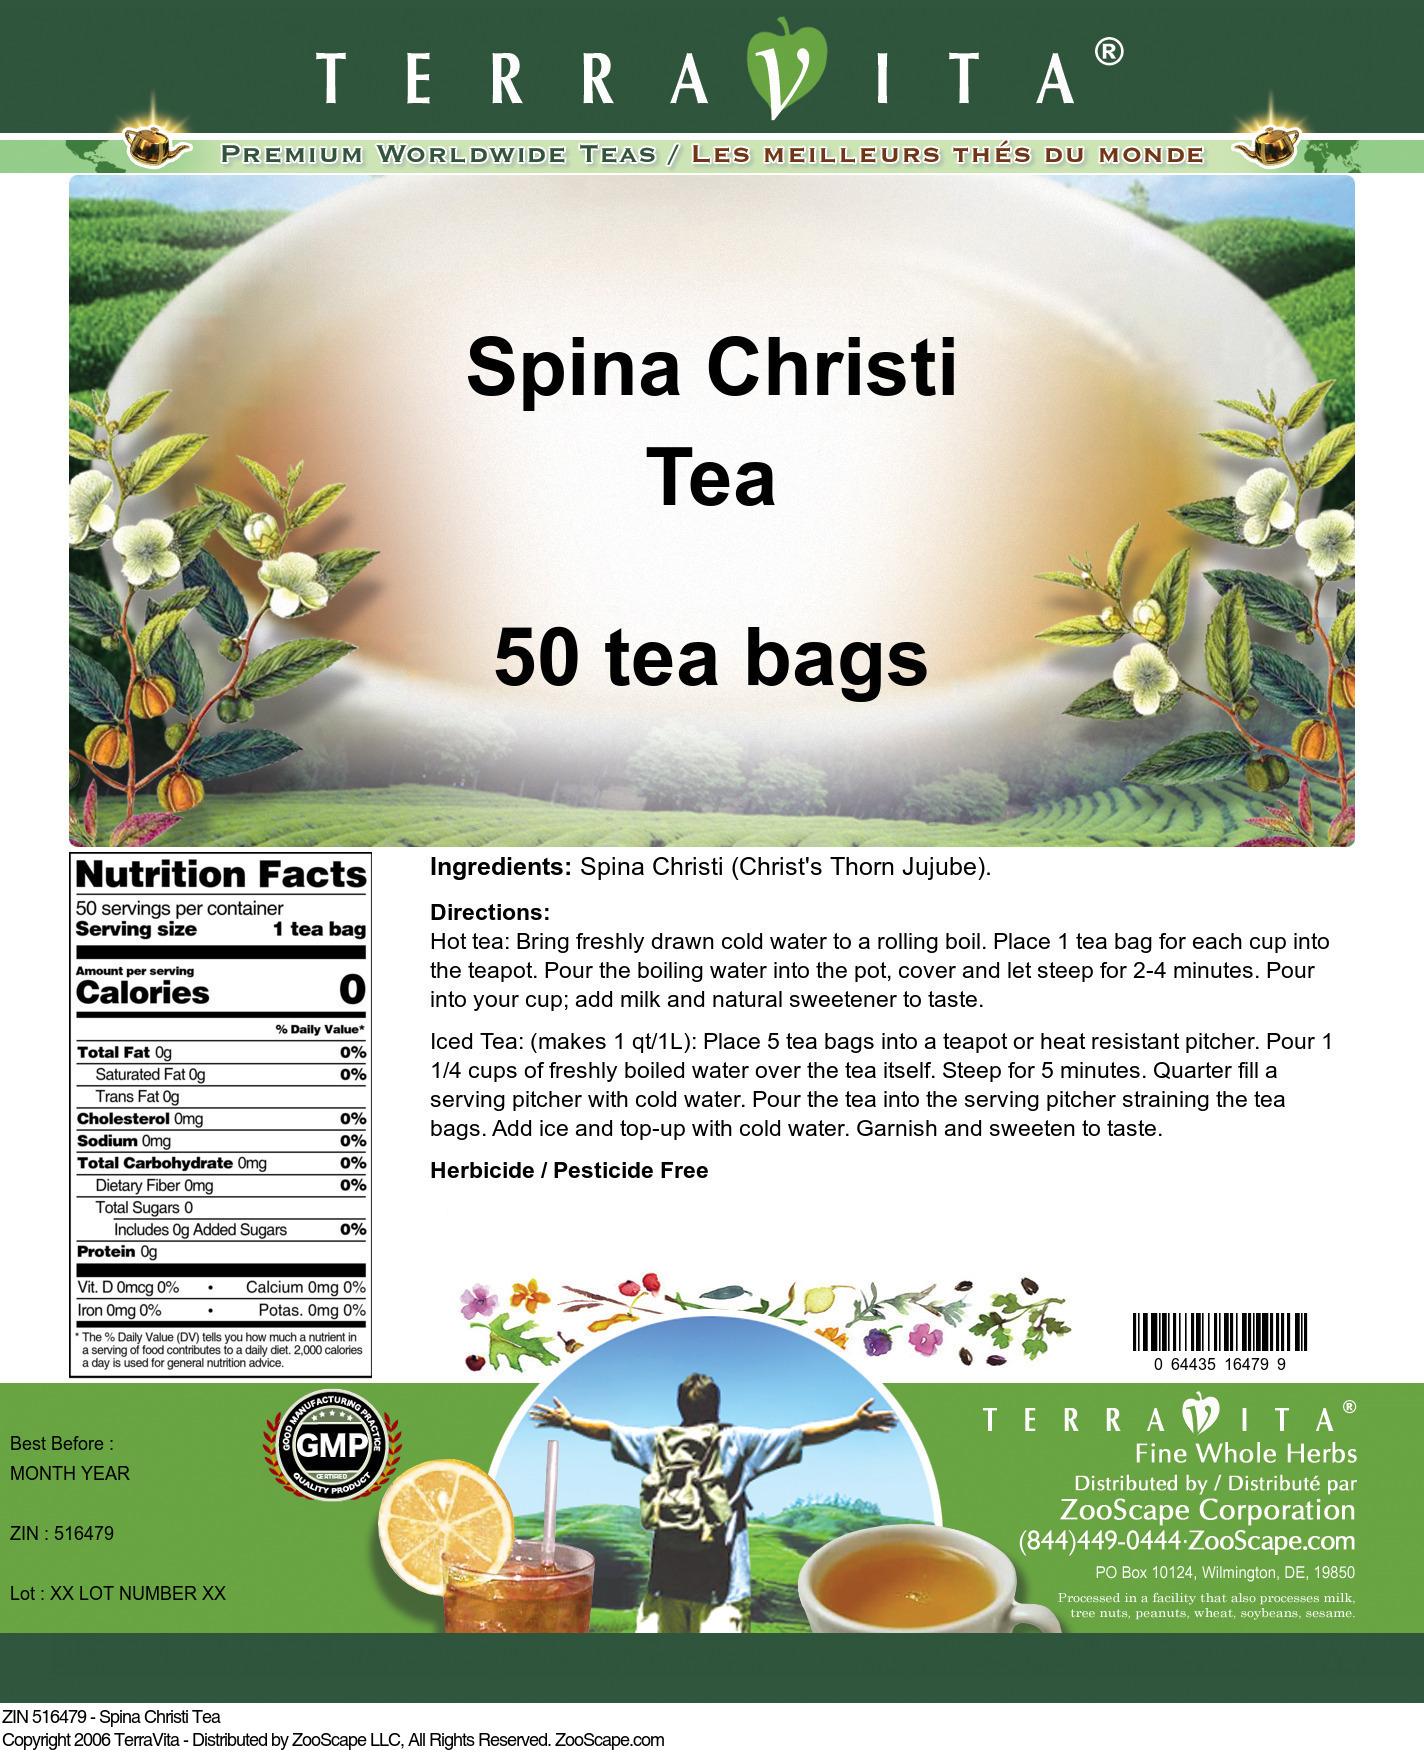 Spina Christi Tea